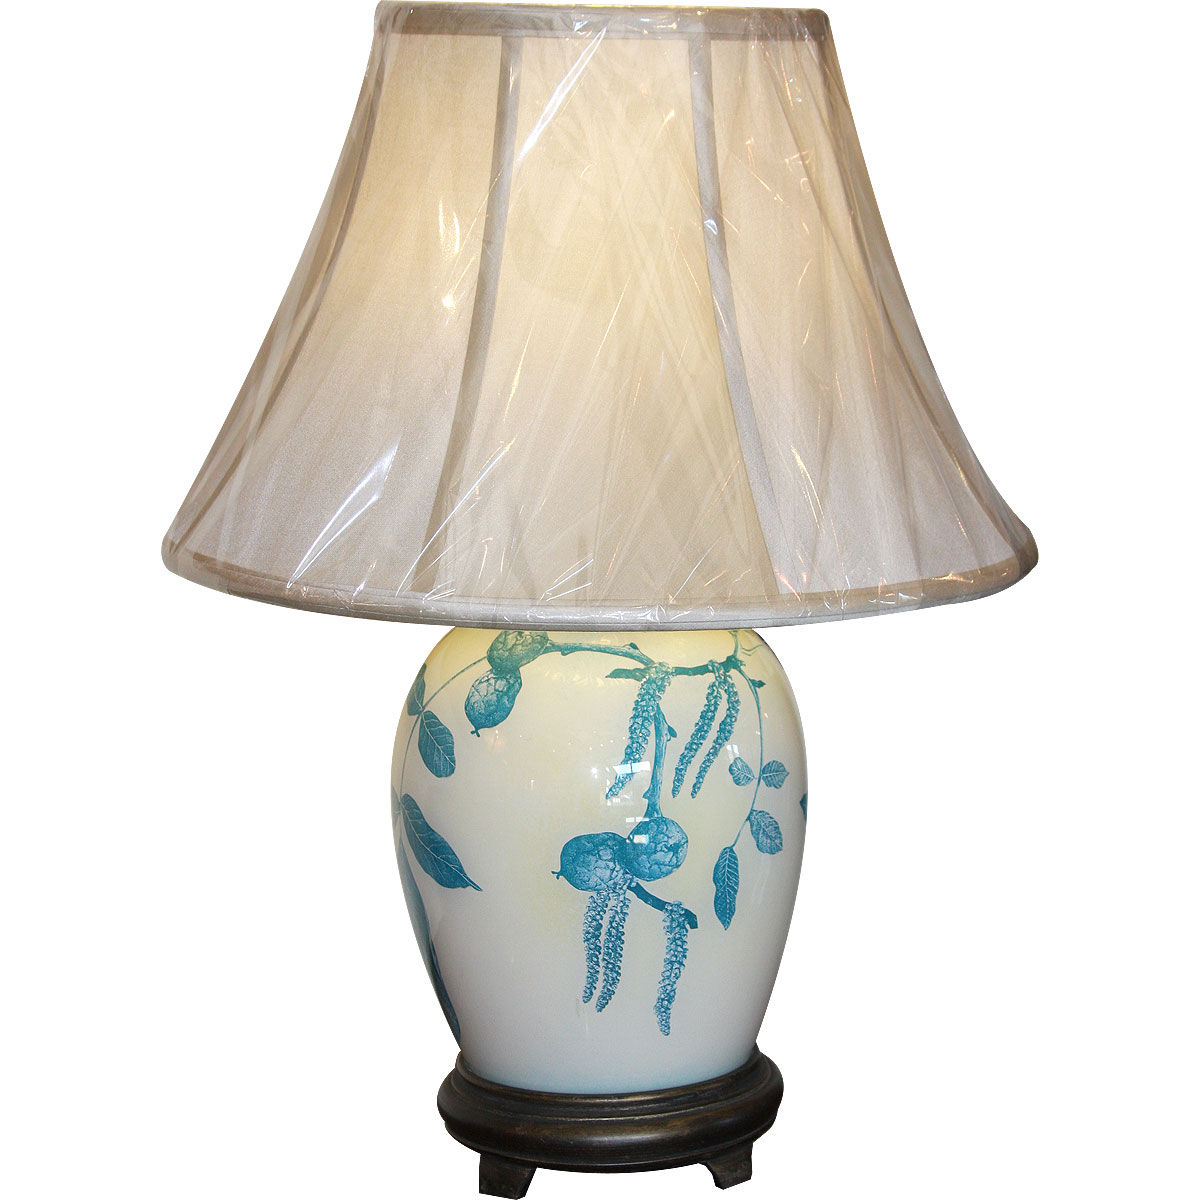 Jenny Worrall Designs glass lamp